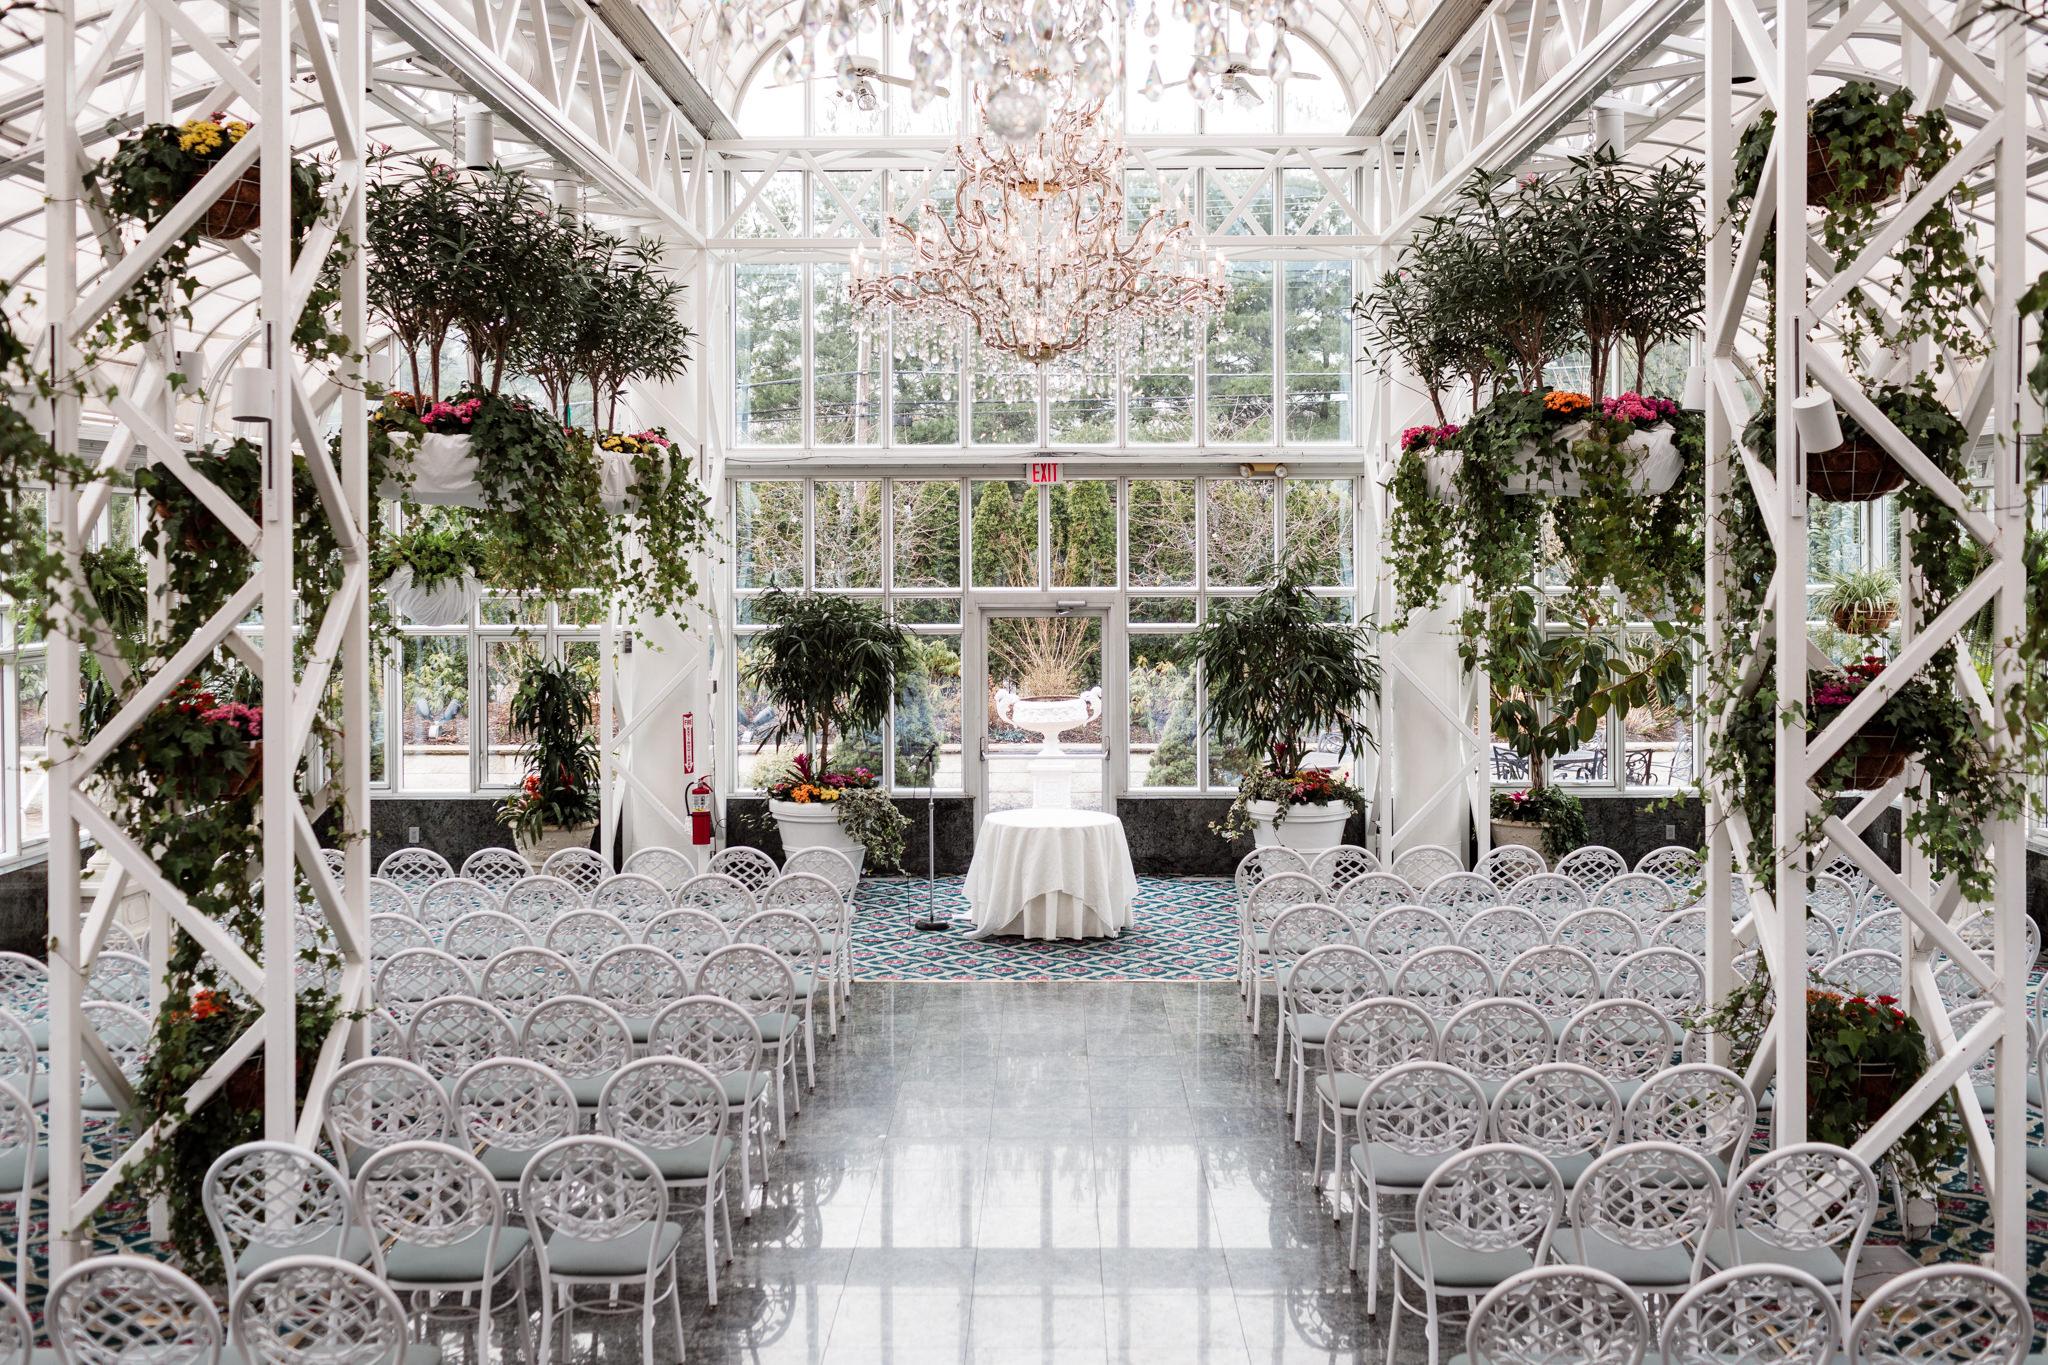 Hanchar_Madison_Hotel_NJ_Wedding_7R5A7868.jpg